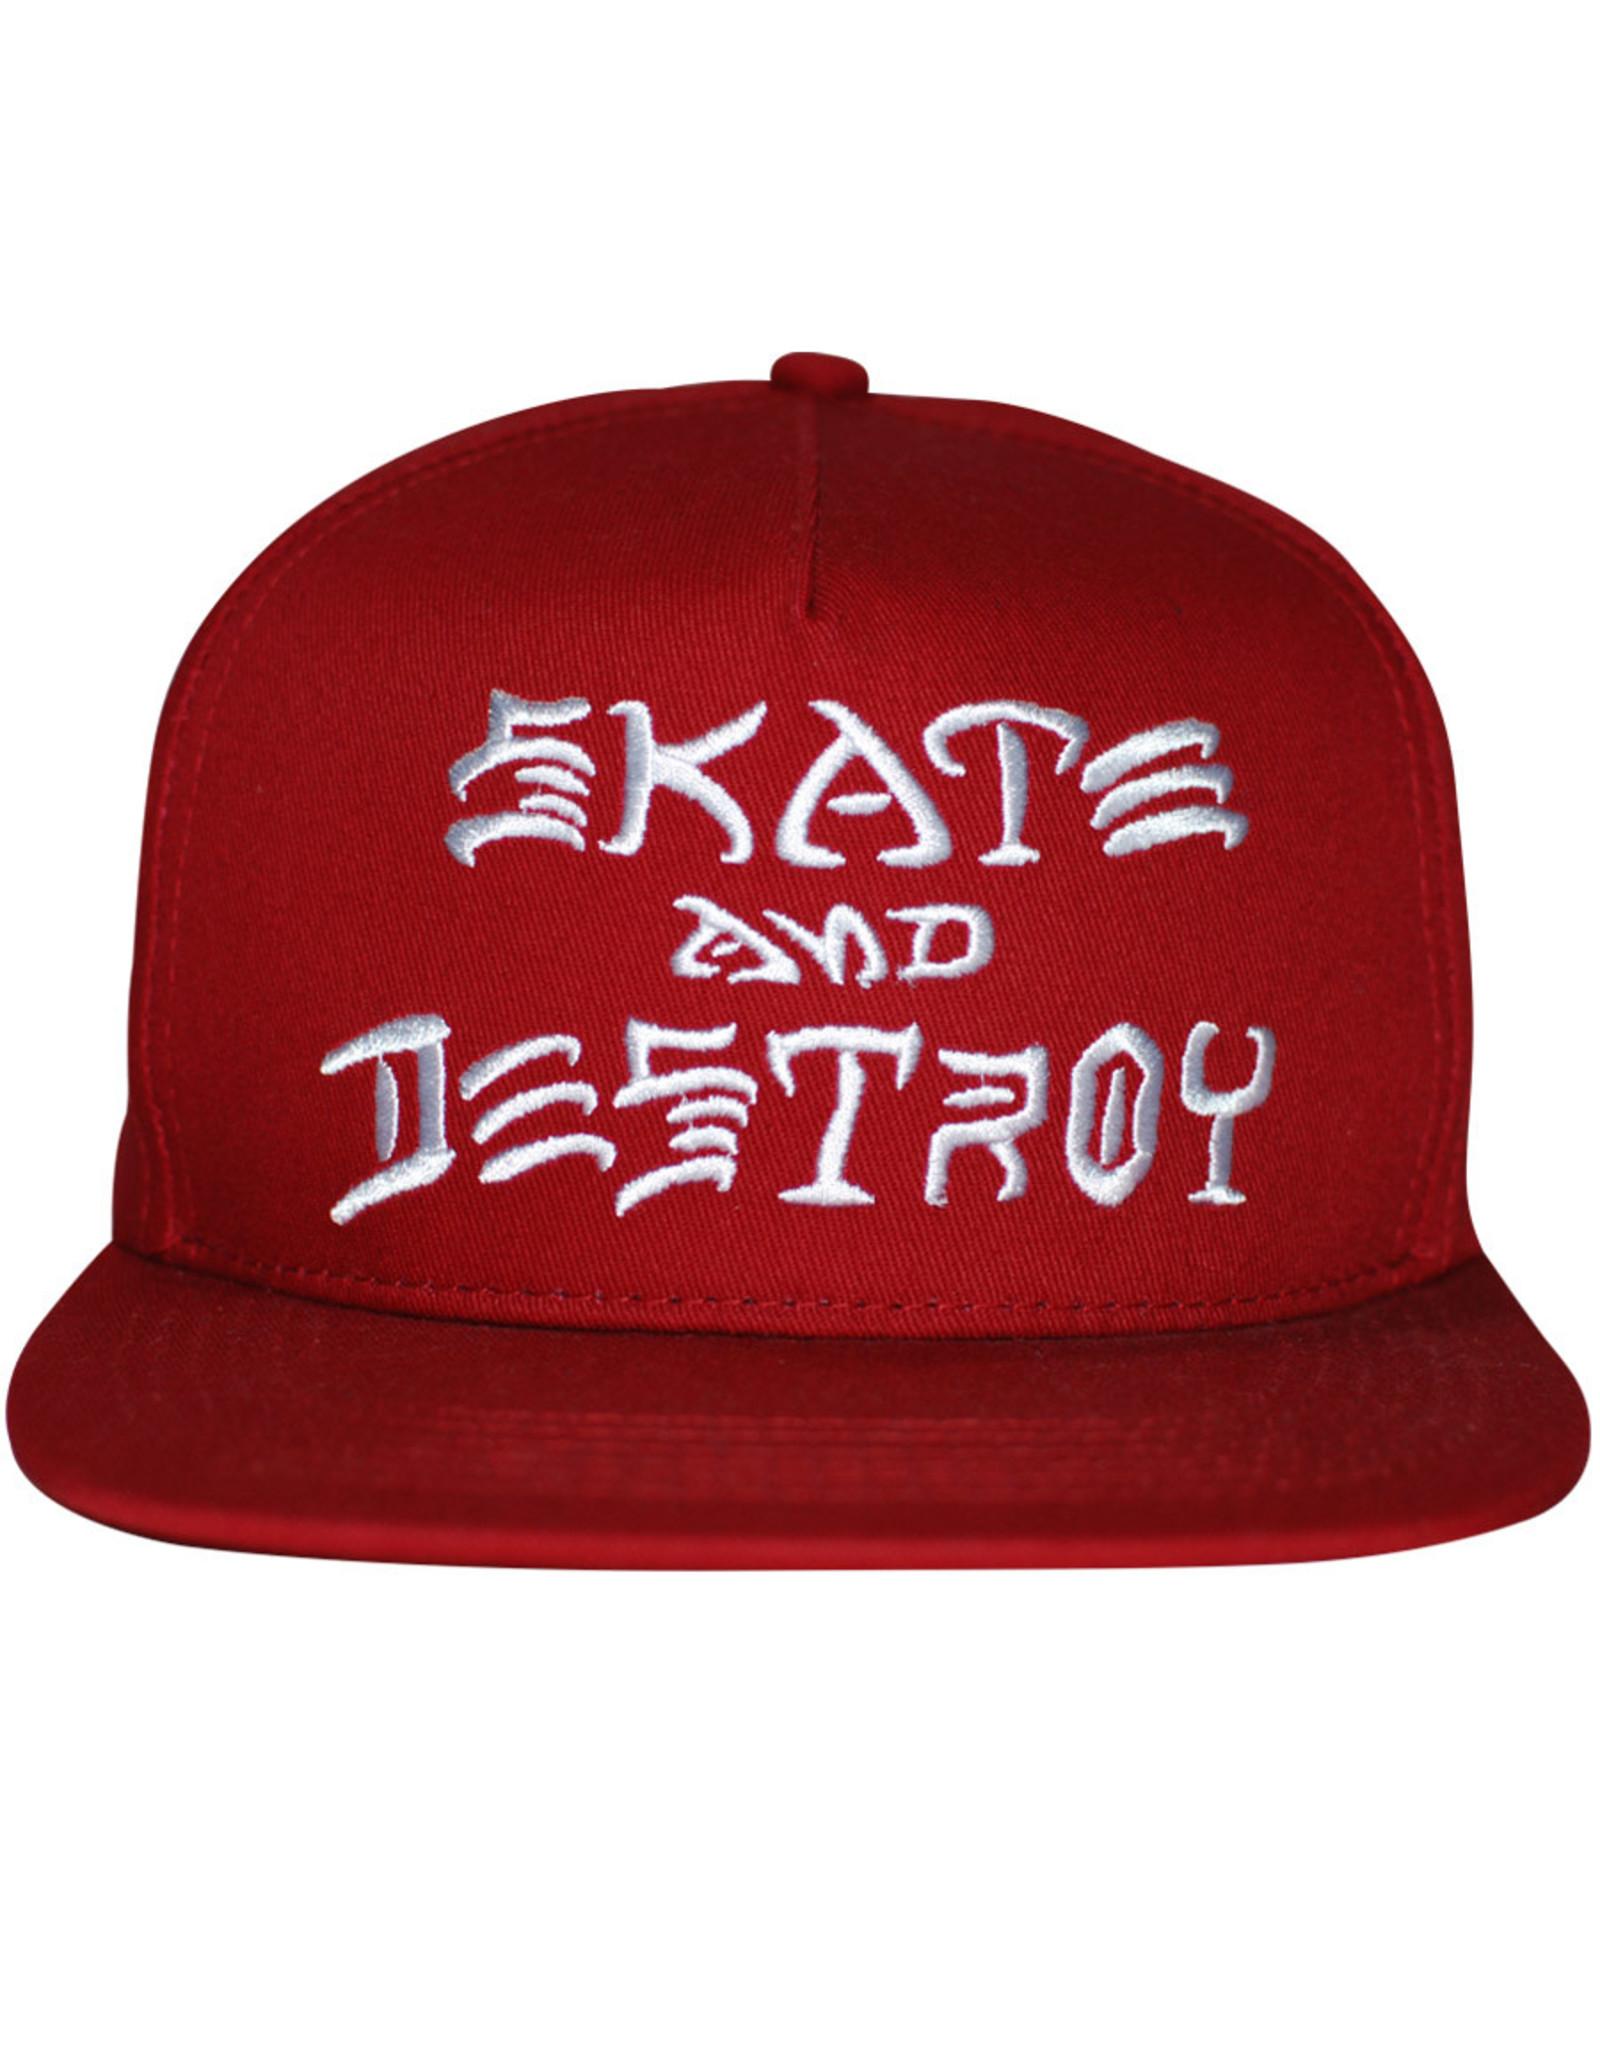 Thrasher Thrasher Hat Sk8 And Destroy Embroidered Snapback (Blood Red)